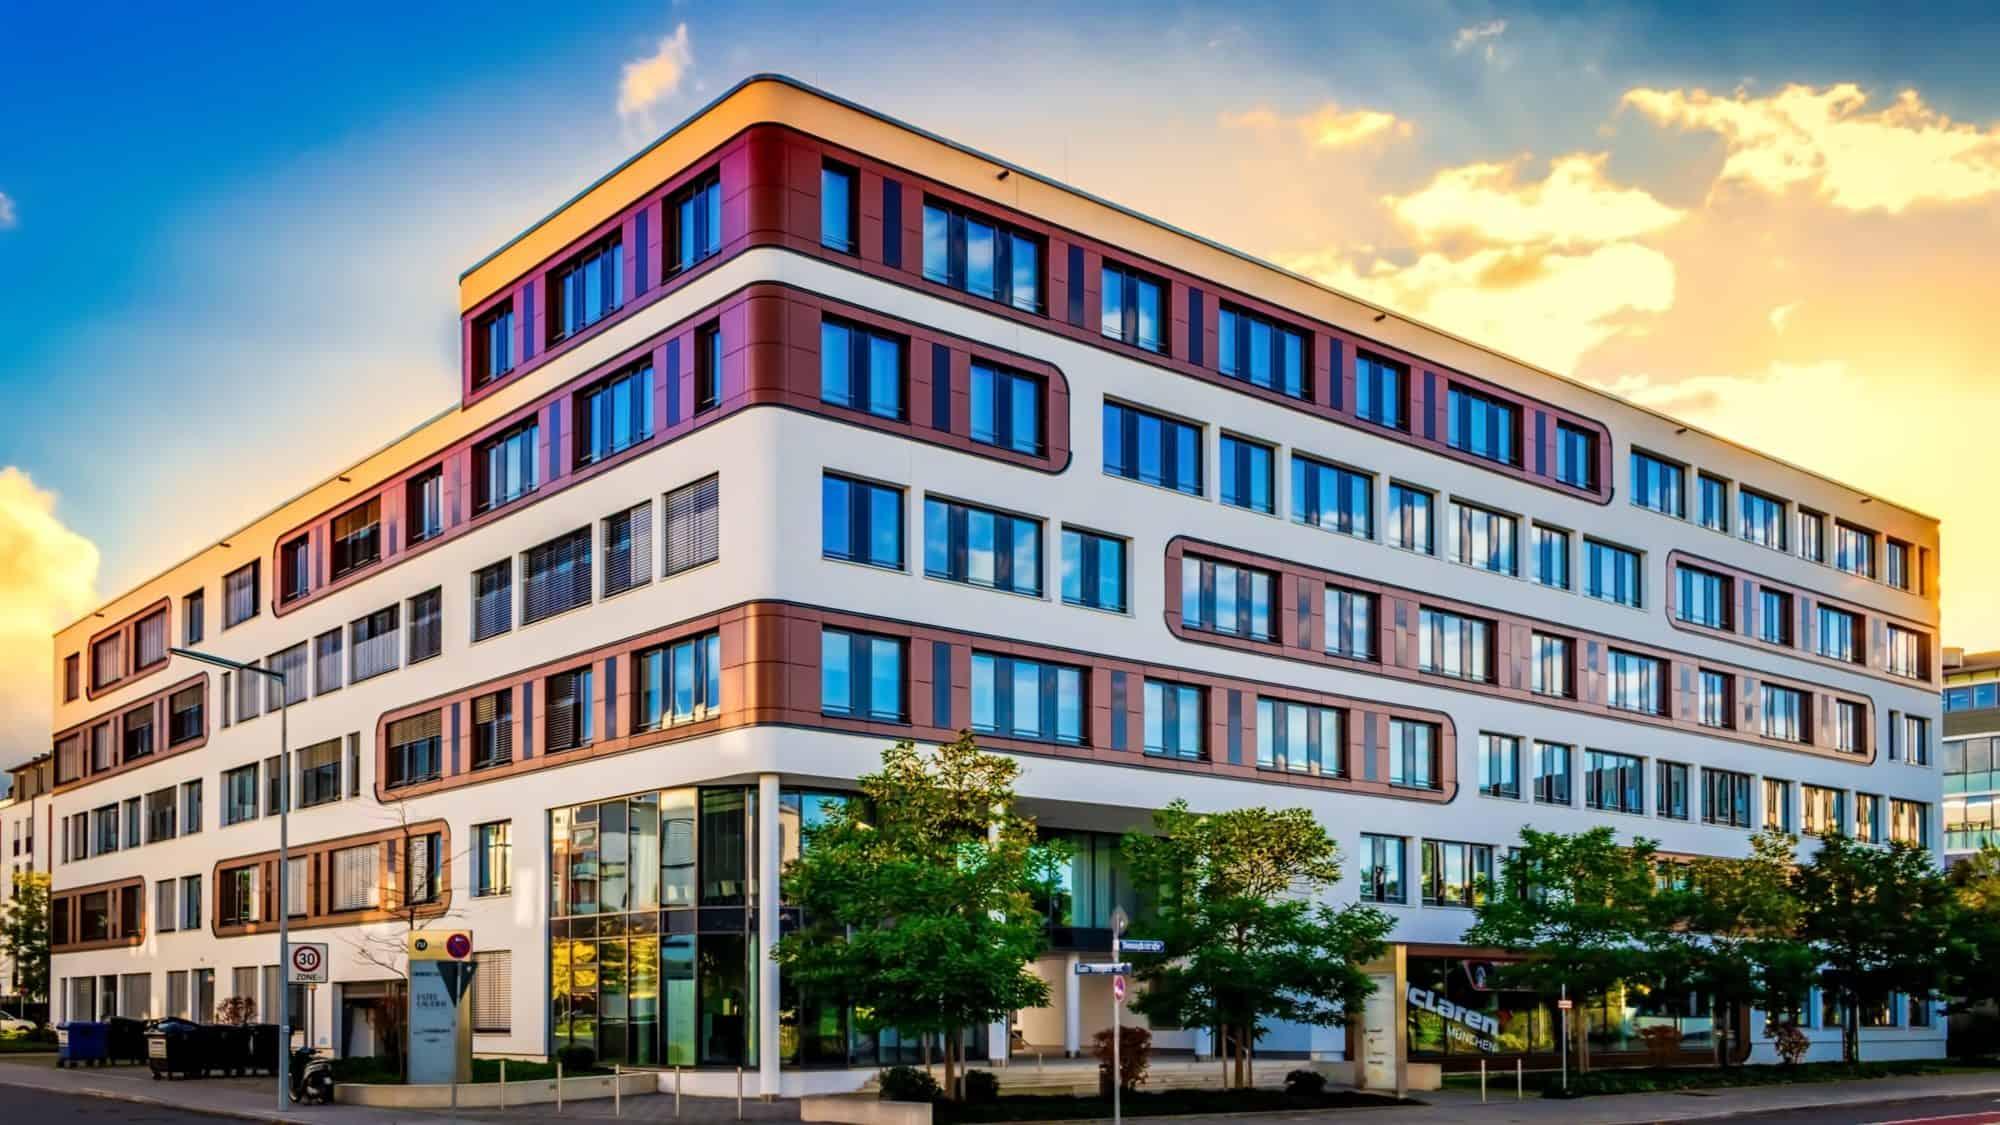 Cologne Immobilien - CENTURY 21 Immobilienmakler Köln Frechen